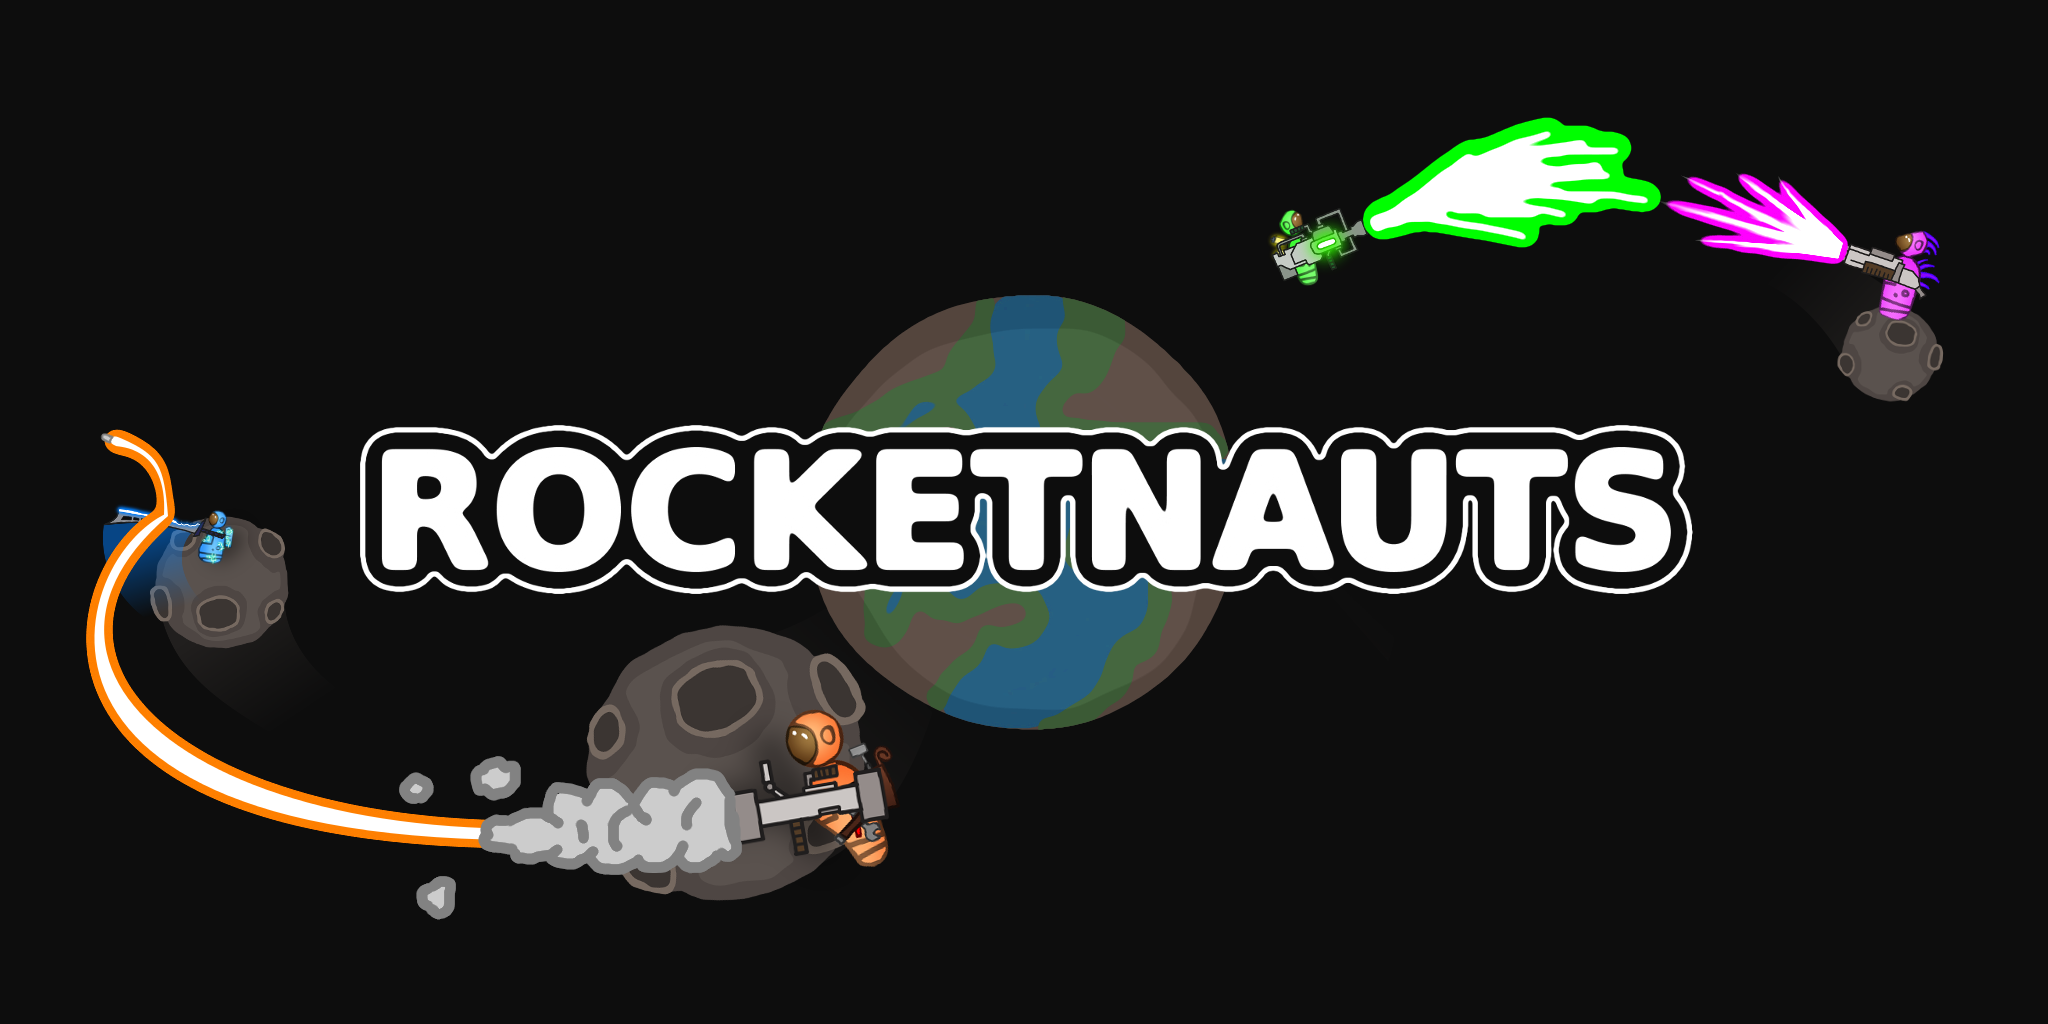 Rocketnauts